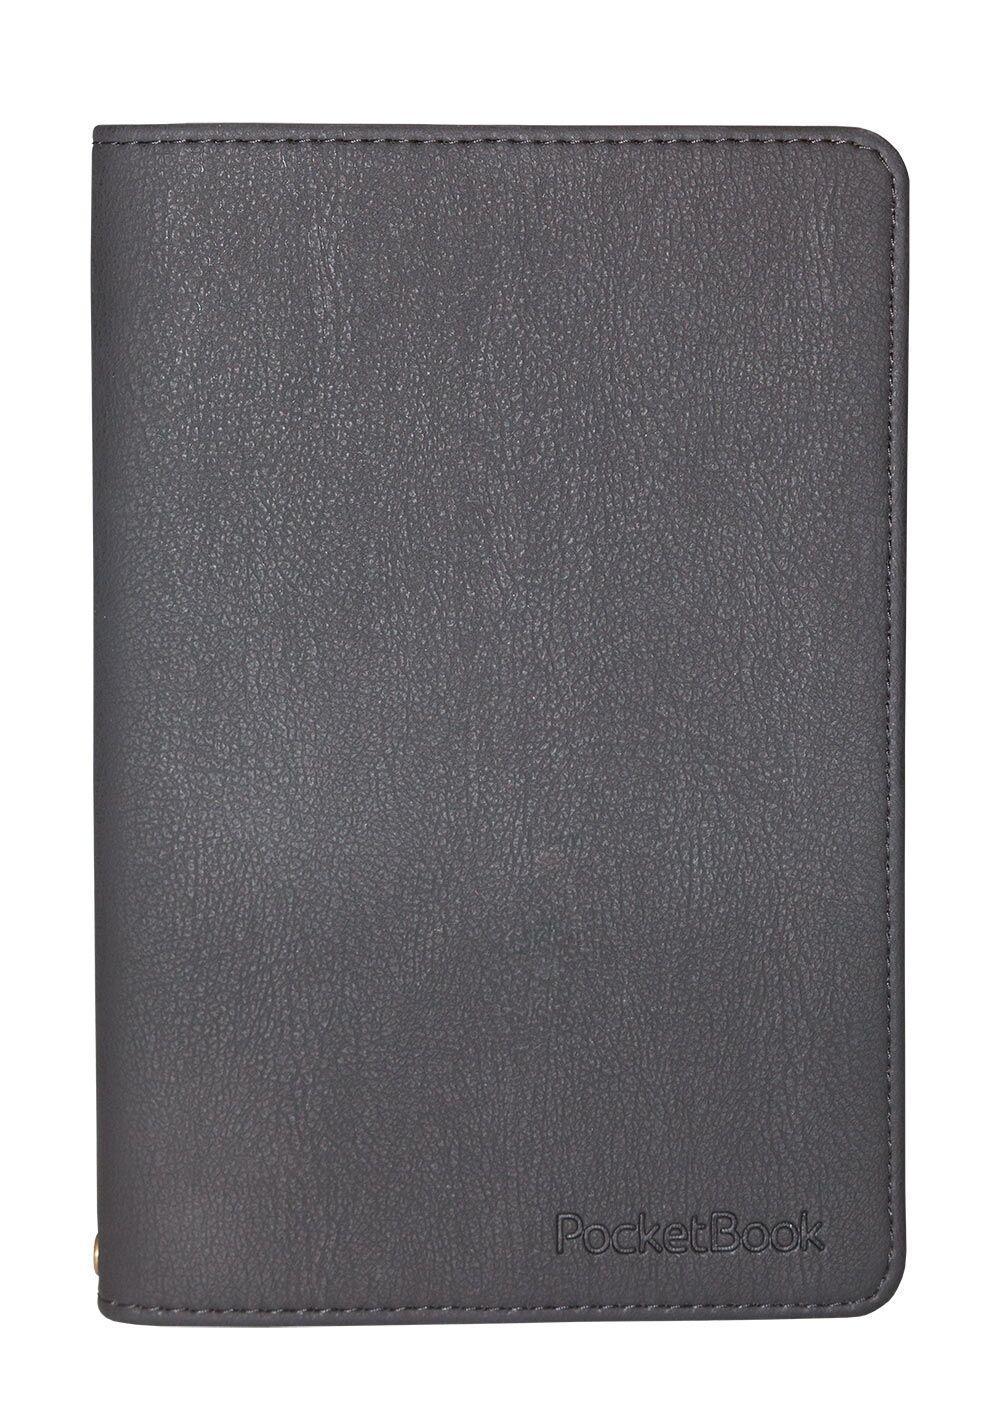 Калъф Pocketbook HD Touch black за eBook четец, 6 inch, Черен